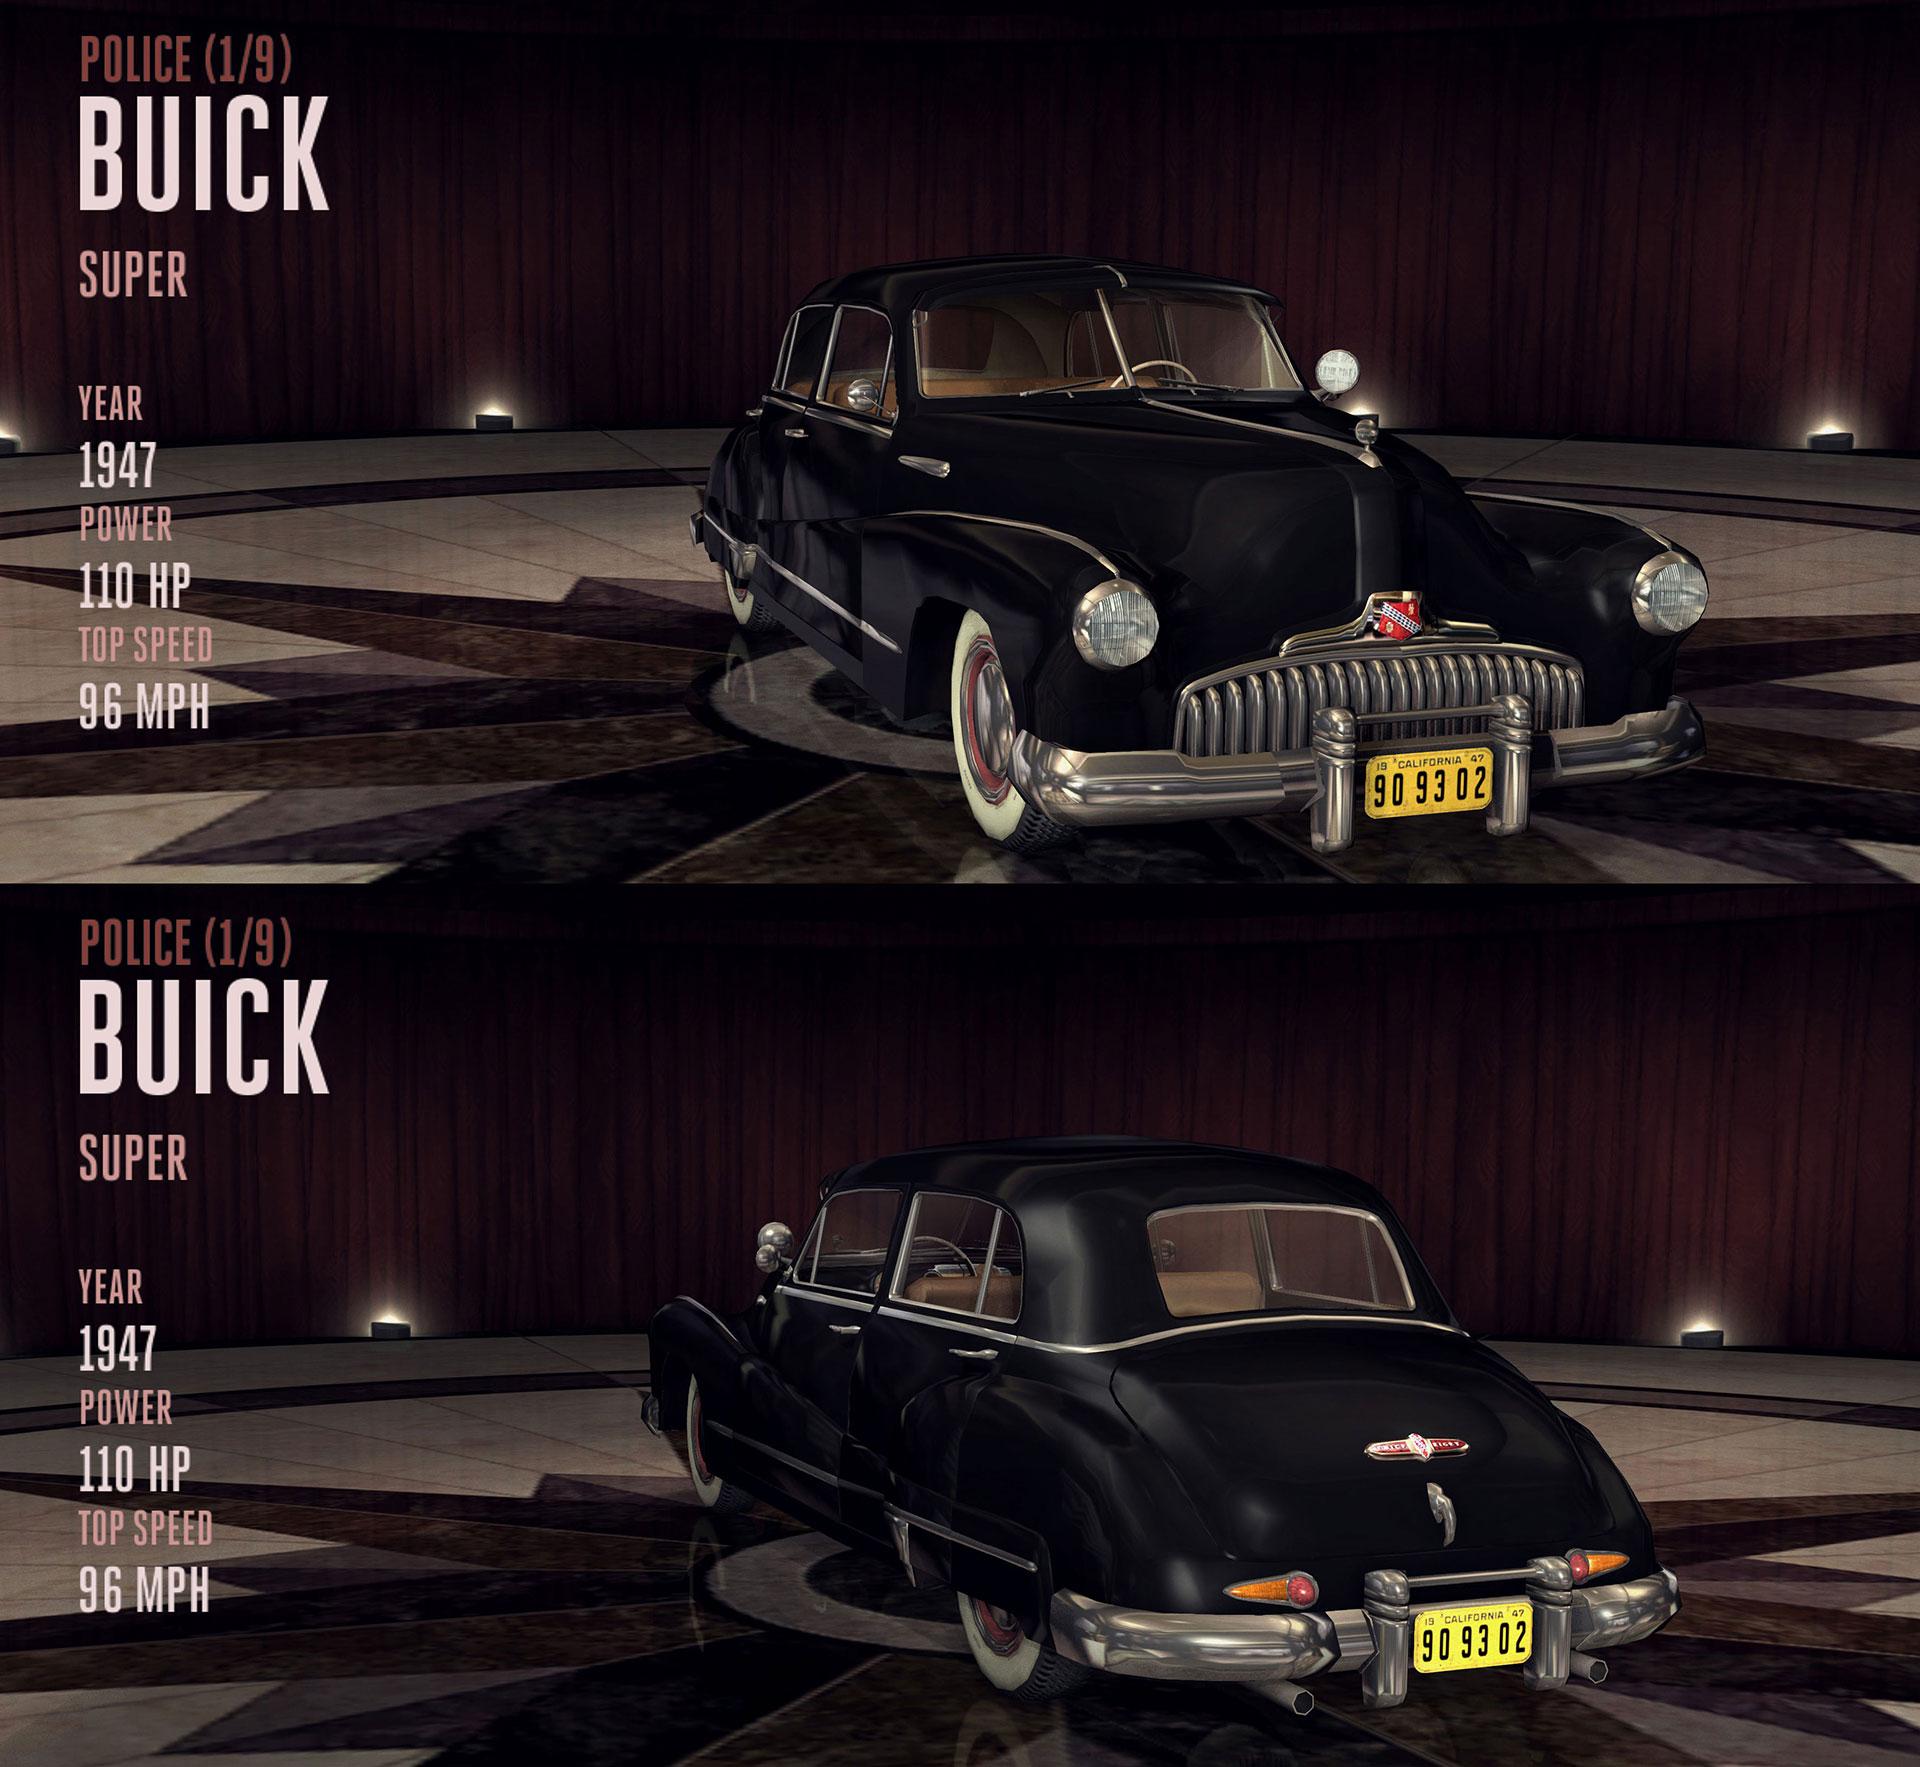 Archivo:1947-buick-super.jpg